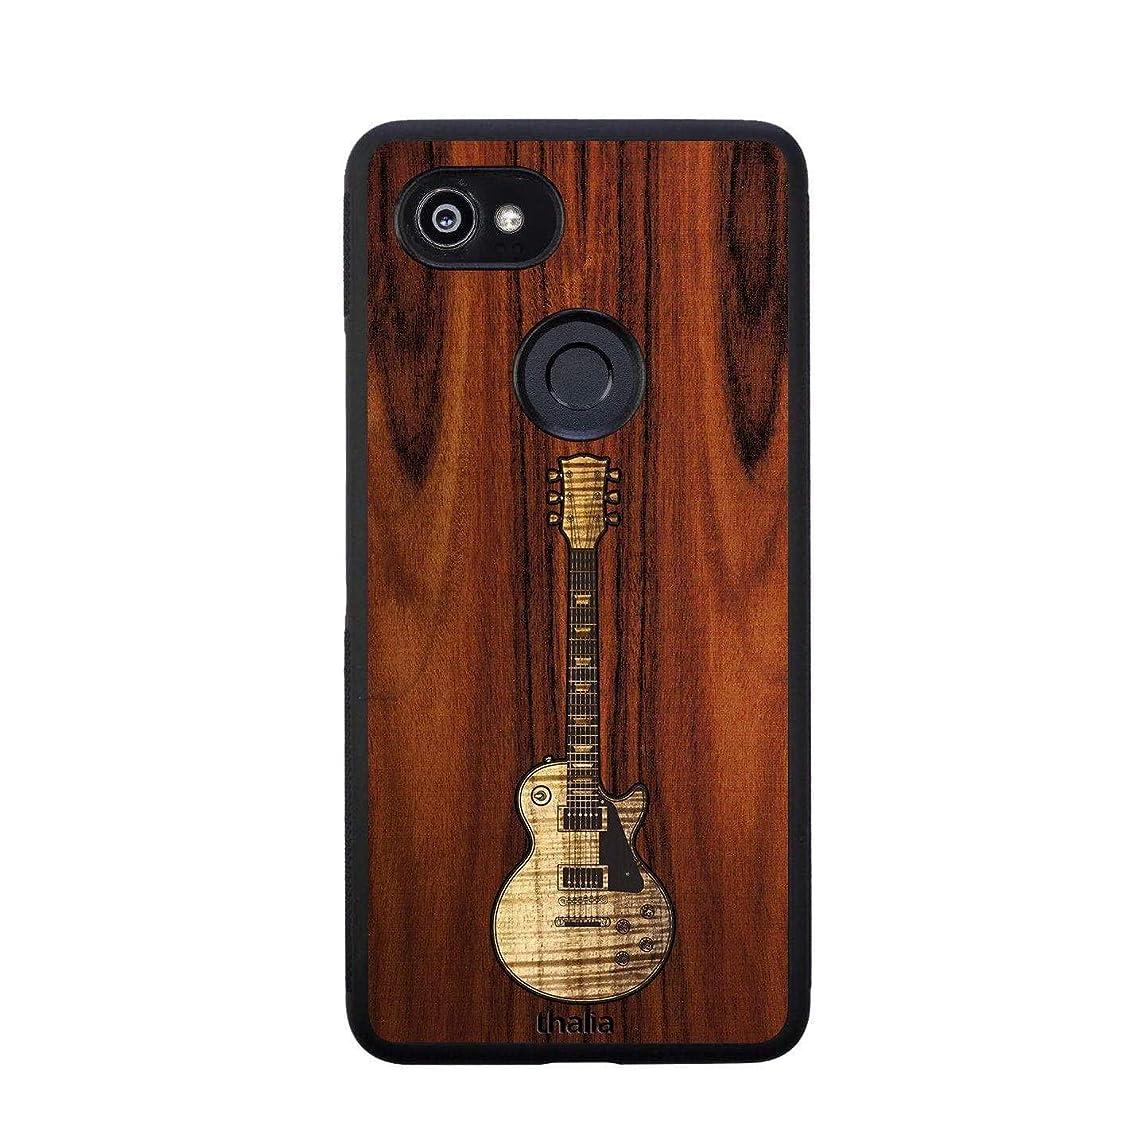 Santos Rosewood & Les Paul Hawaiian Koa Inlaid Guitar Phone Case | Thalia Exotic Wood Cases Google Pixel 2XL